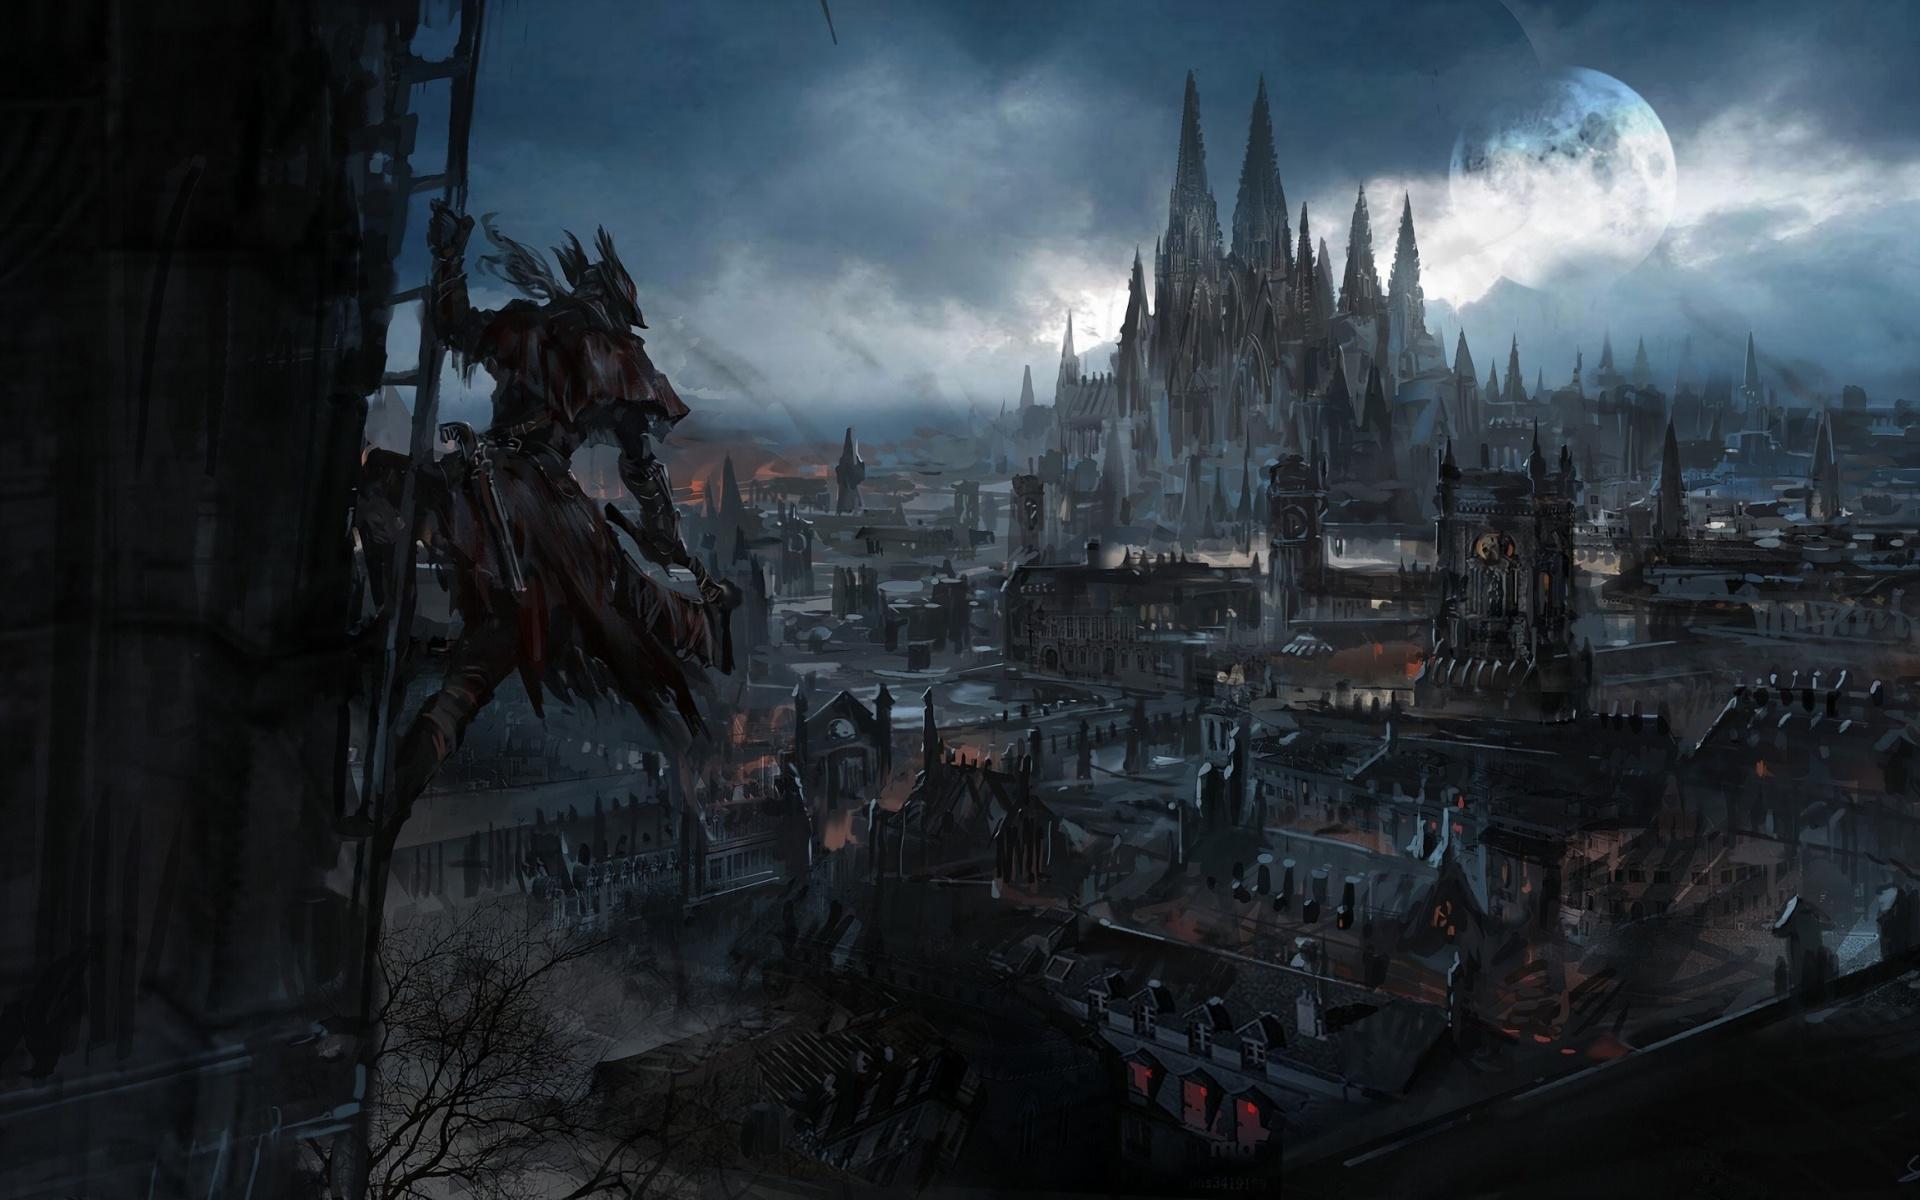 Wallpaper Dark Fantasy City Bloodborne Video Game Bloodborne City 1905980 Hd Wallpaper Backgrounds Download